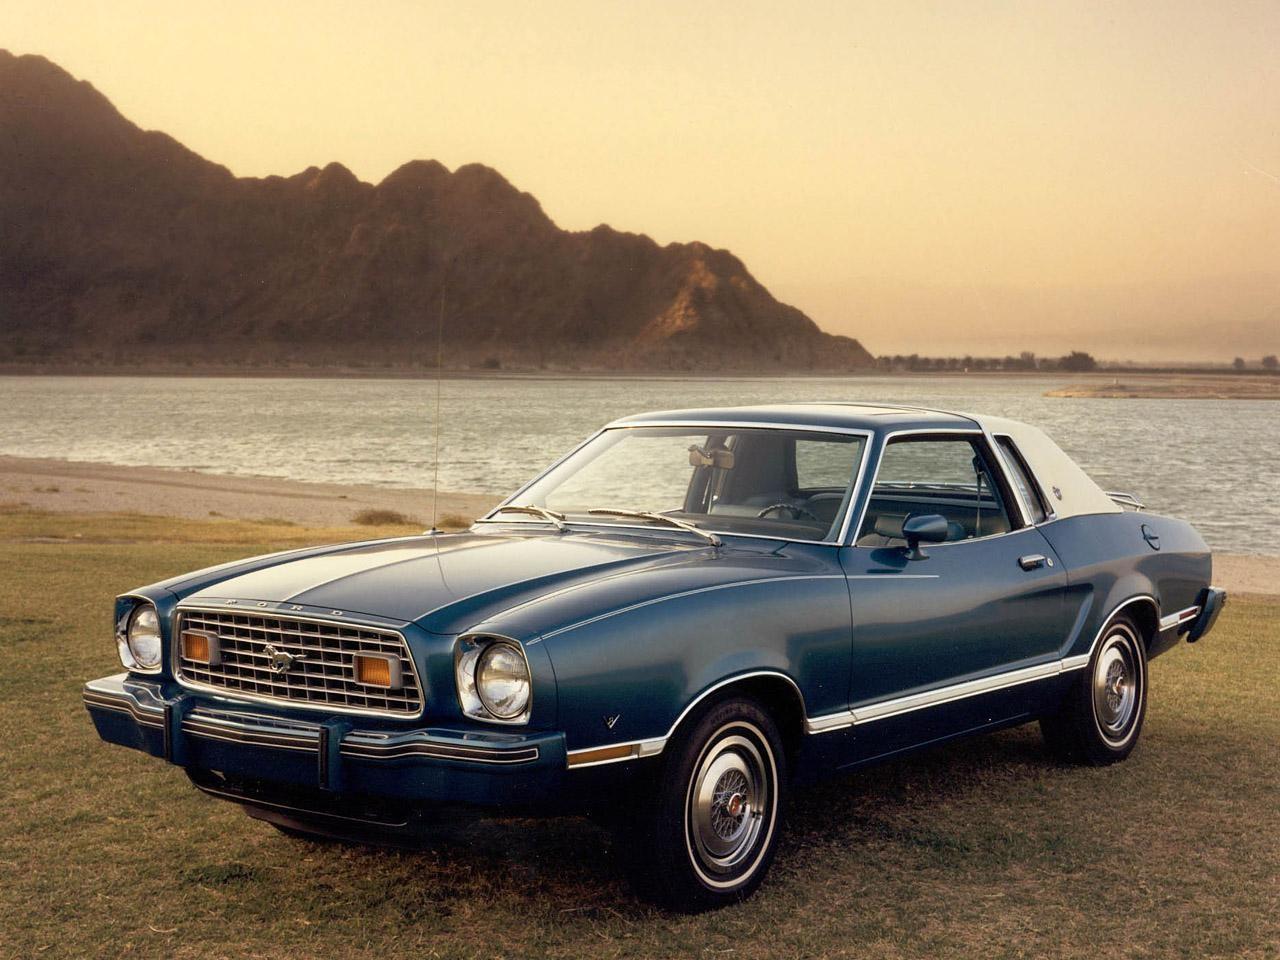 1977 Mustang Photo Collection - MustangAttitude